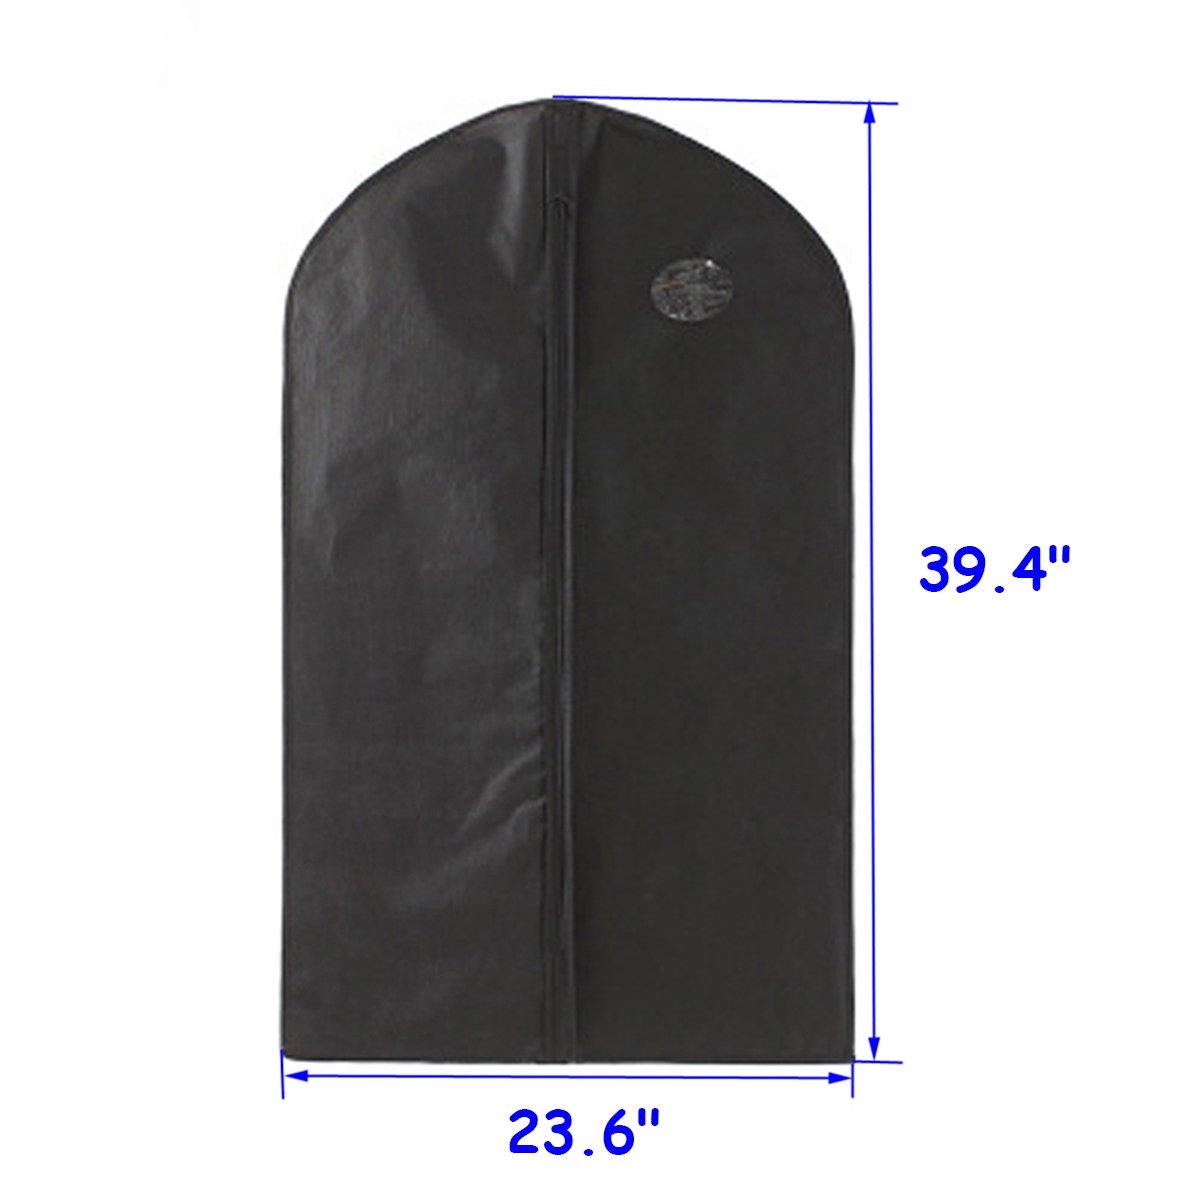 MotGlobal Global MOT 15, 15, 15, Schwarz schwarz - Pack of 3 B0798PWDQ9 Kleiderscke 6c1239